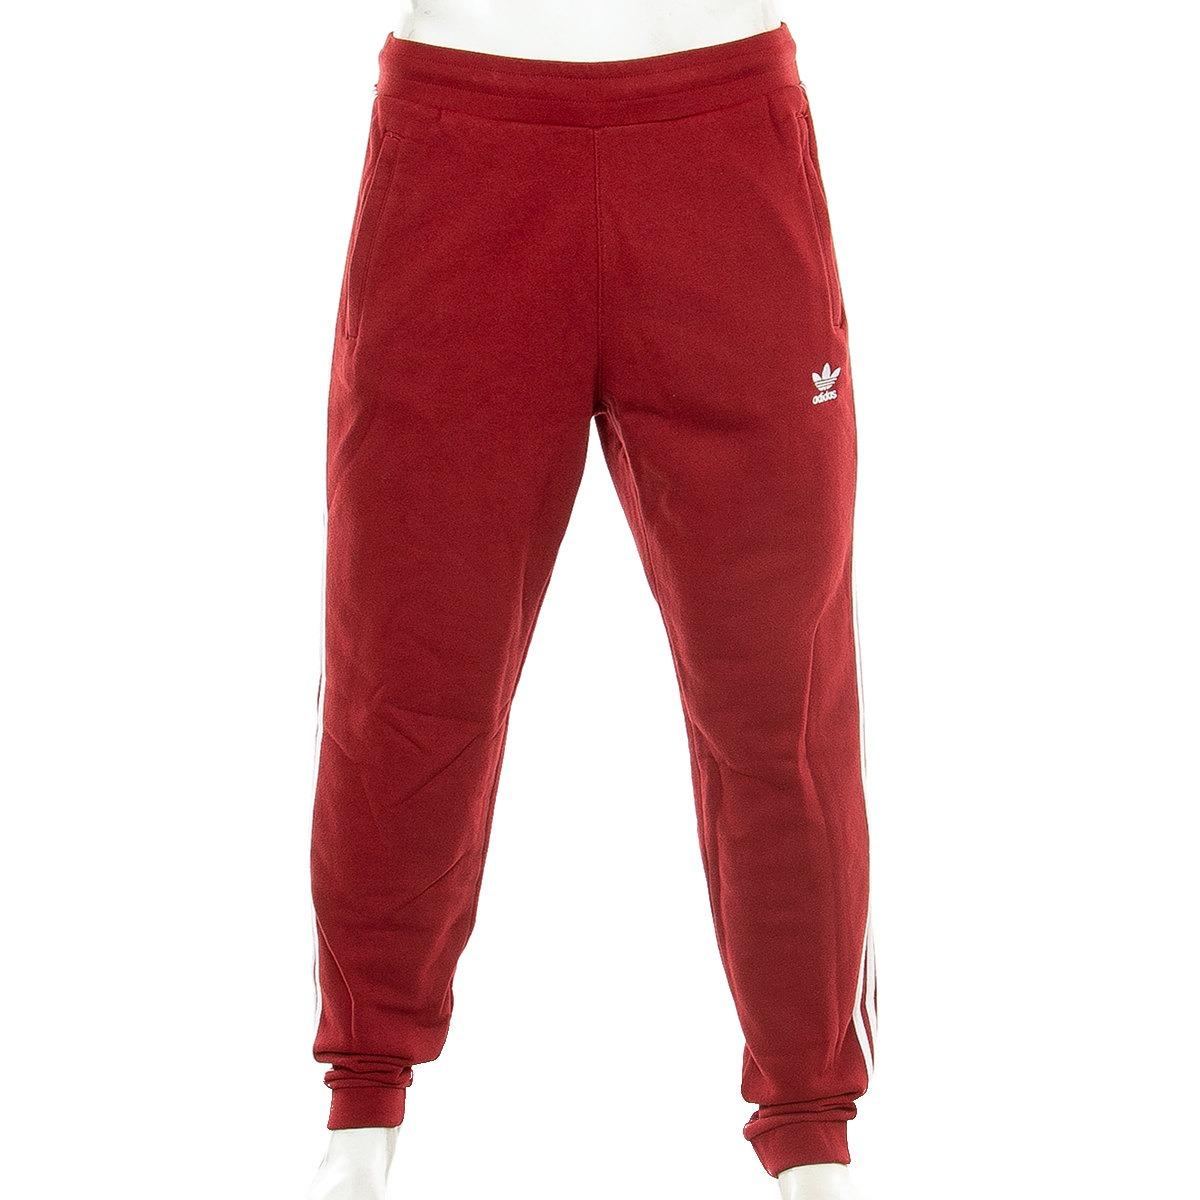 3 Tienda Oficial Tiras 00 En 789 Adidas Pantalón Originals qwFBnd